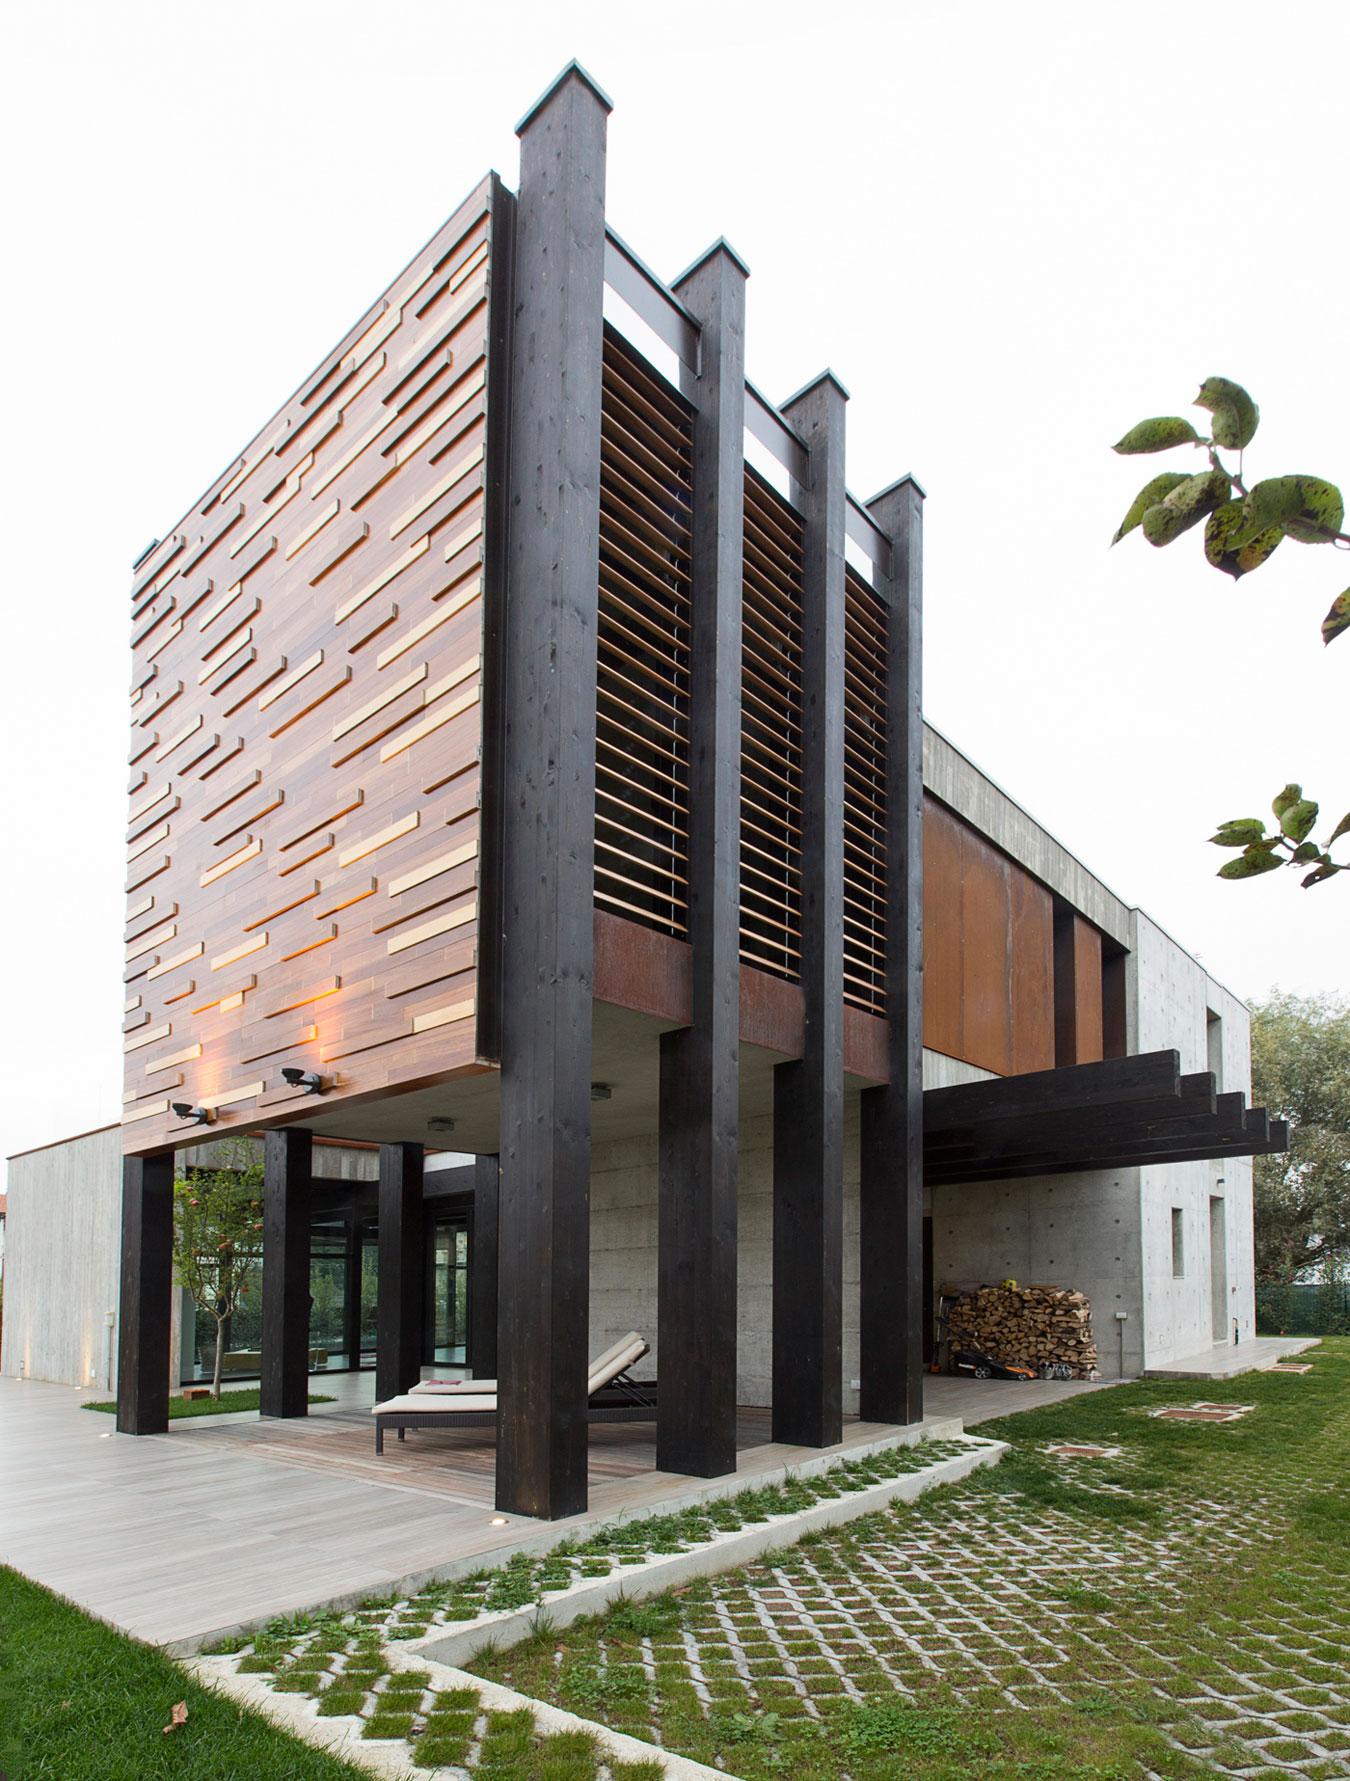 D'Autore Residence near Bologna by Giraldi Associati Architetti-03